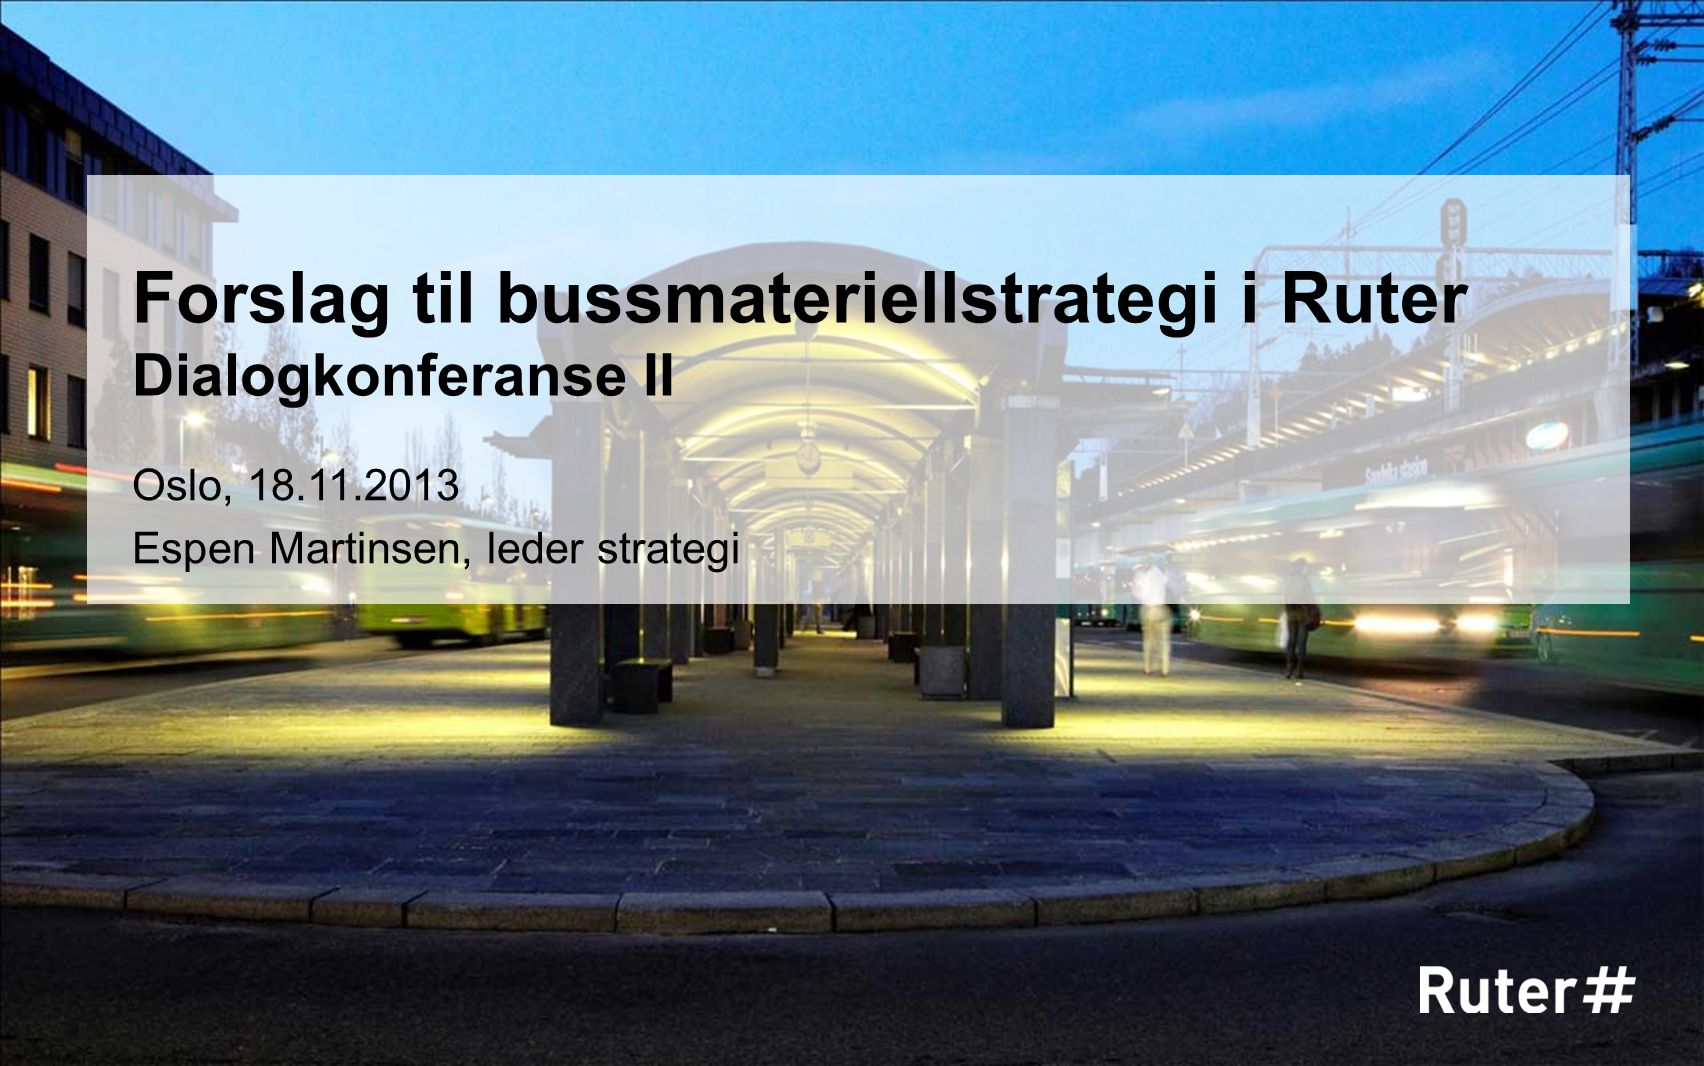 Forslag til bussmateriellstrategi i Ruter Dialogkonferanse II